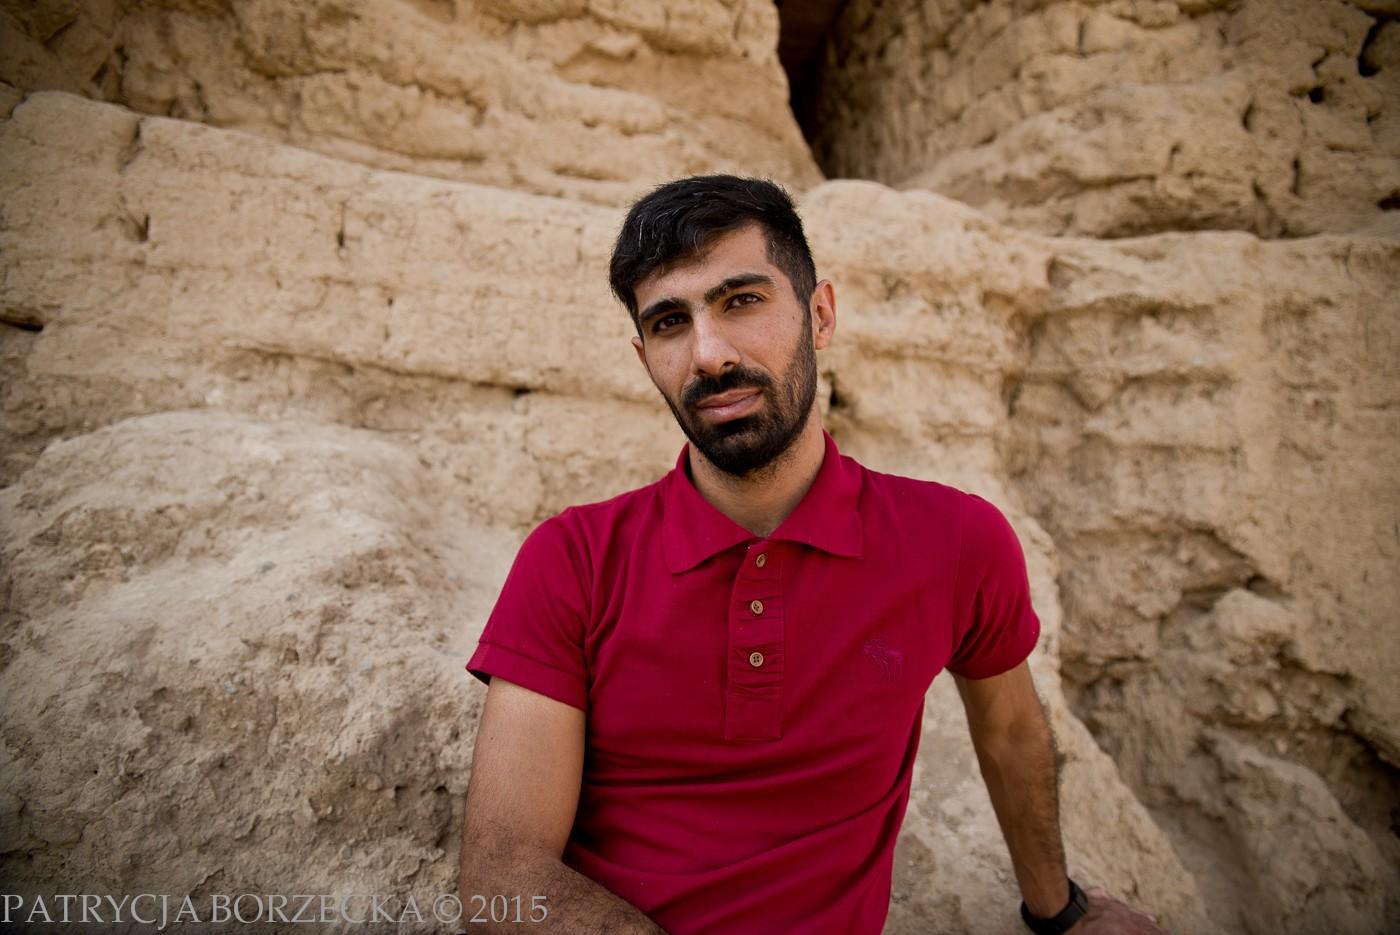 PatrycjaBorzecka-photography-Iran-people06